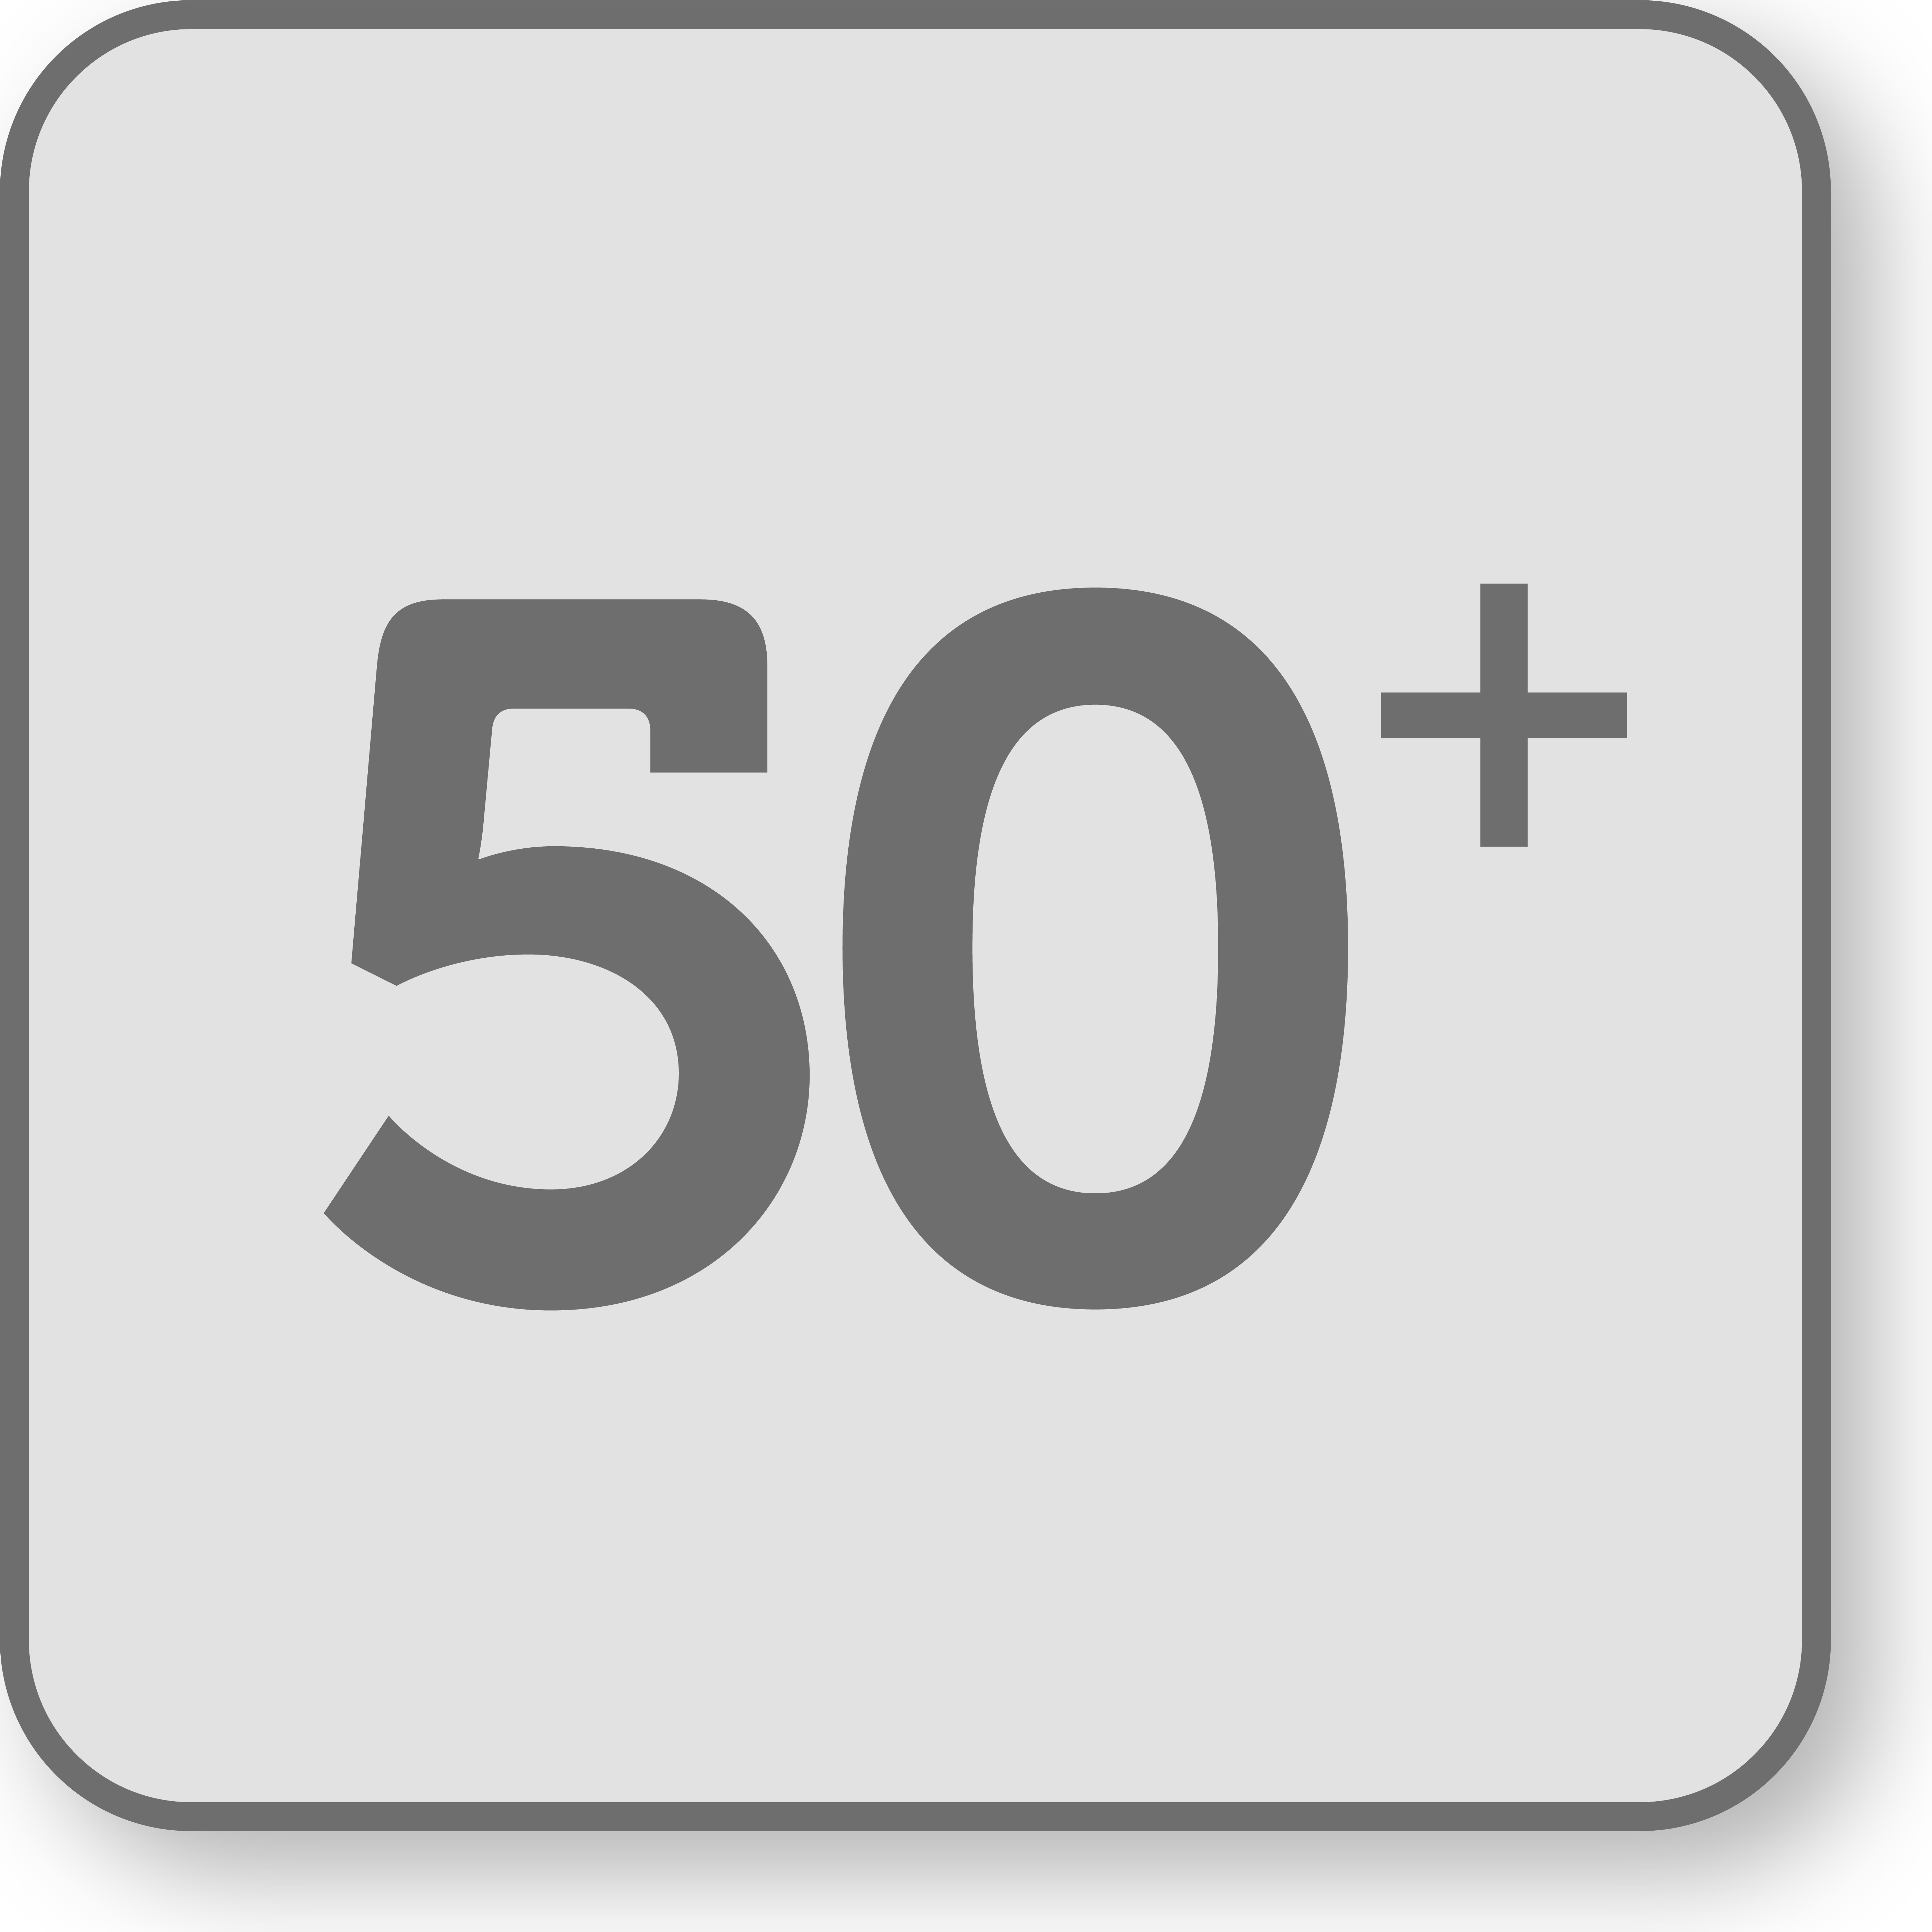 Toepassingen Curasense_Gezond-ouder-senioren-ouderen-50plus